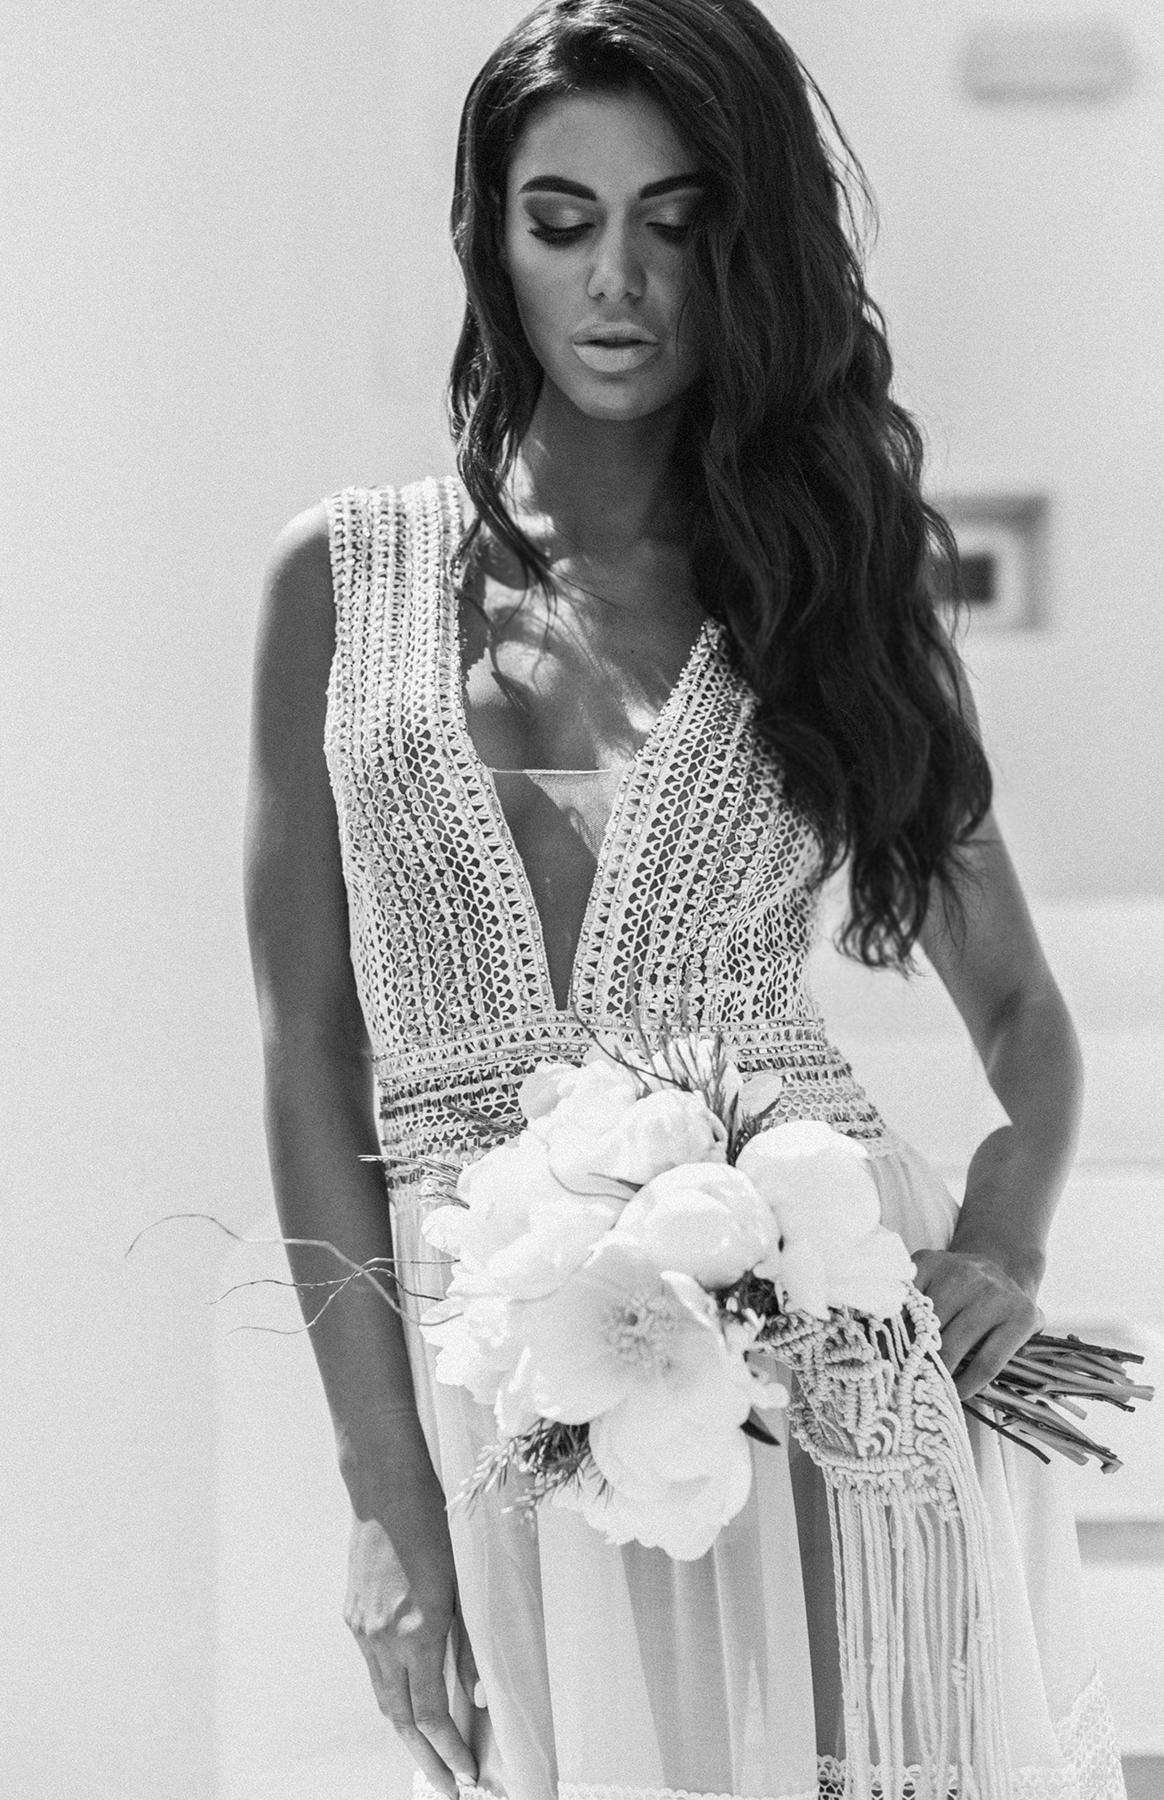 nora-bridal-photographer-marbella-spain-taylor-content.jpg